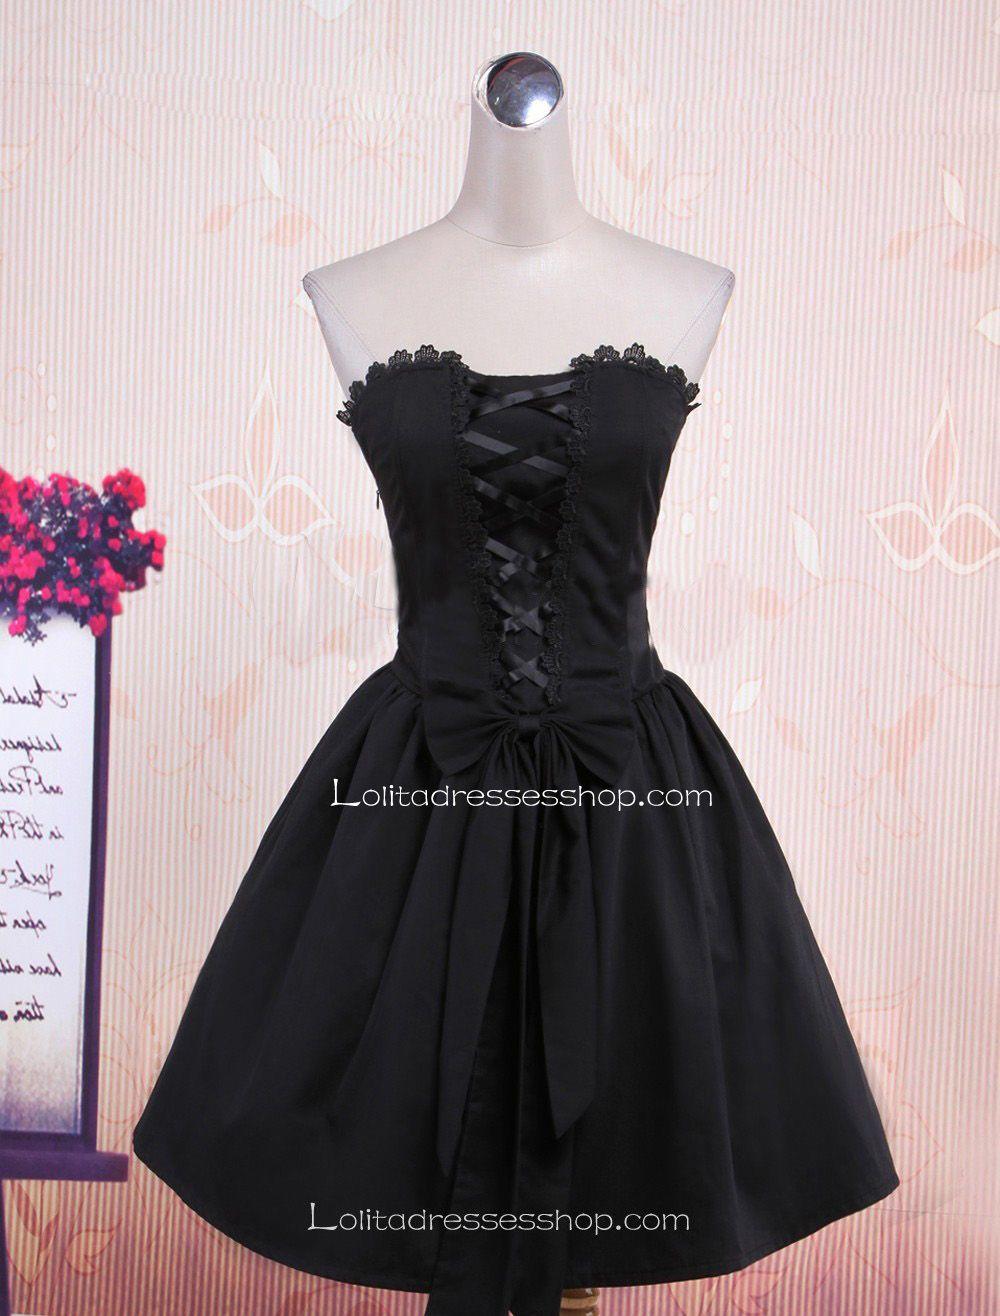 cheap black tube top sleeveless plain bow punk lolita dress sale at